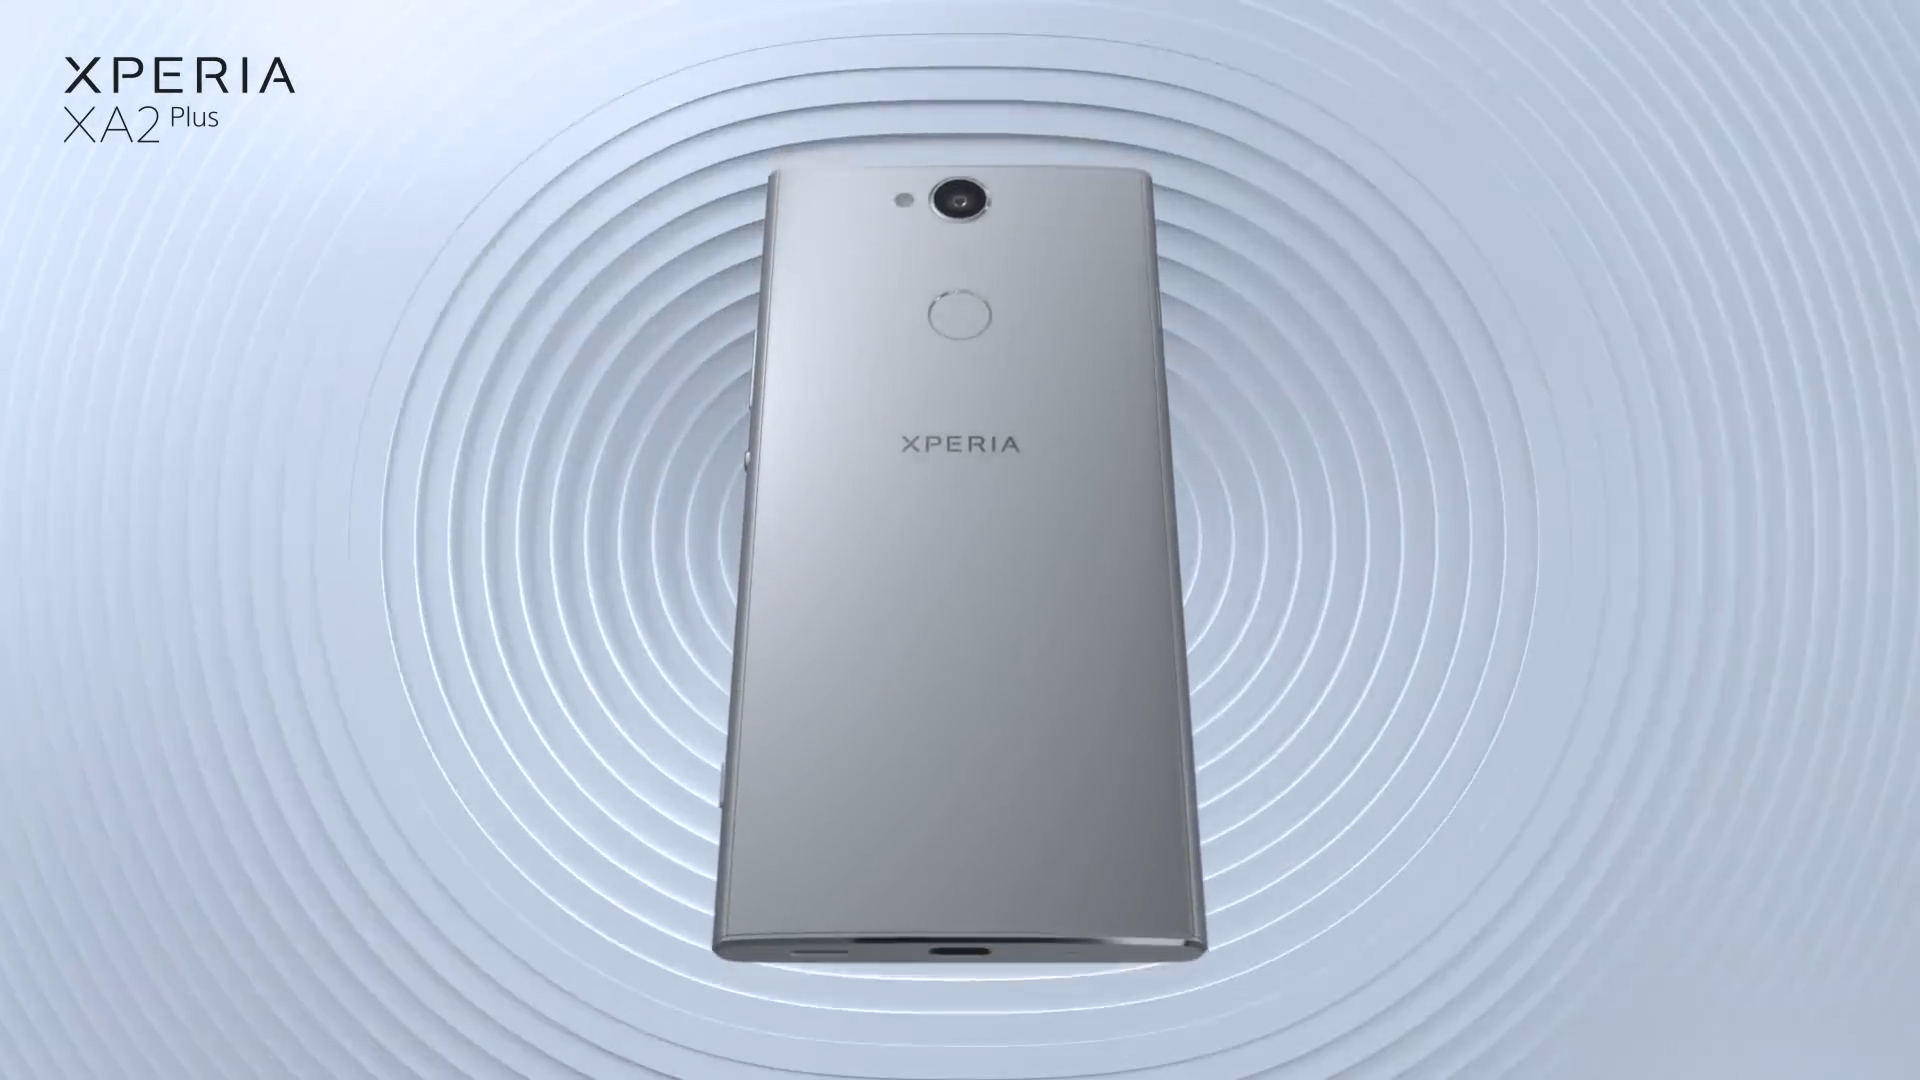 xperia xa2 plus review.jpg